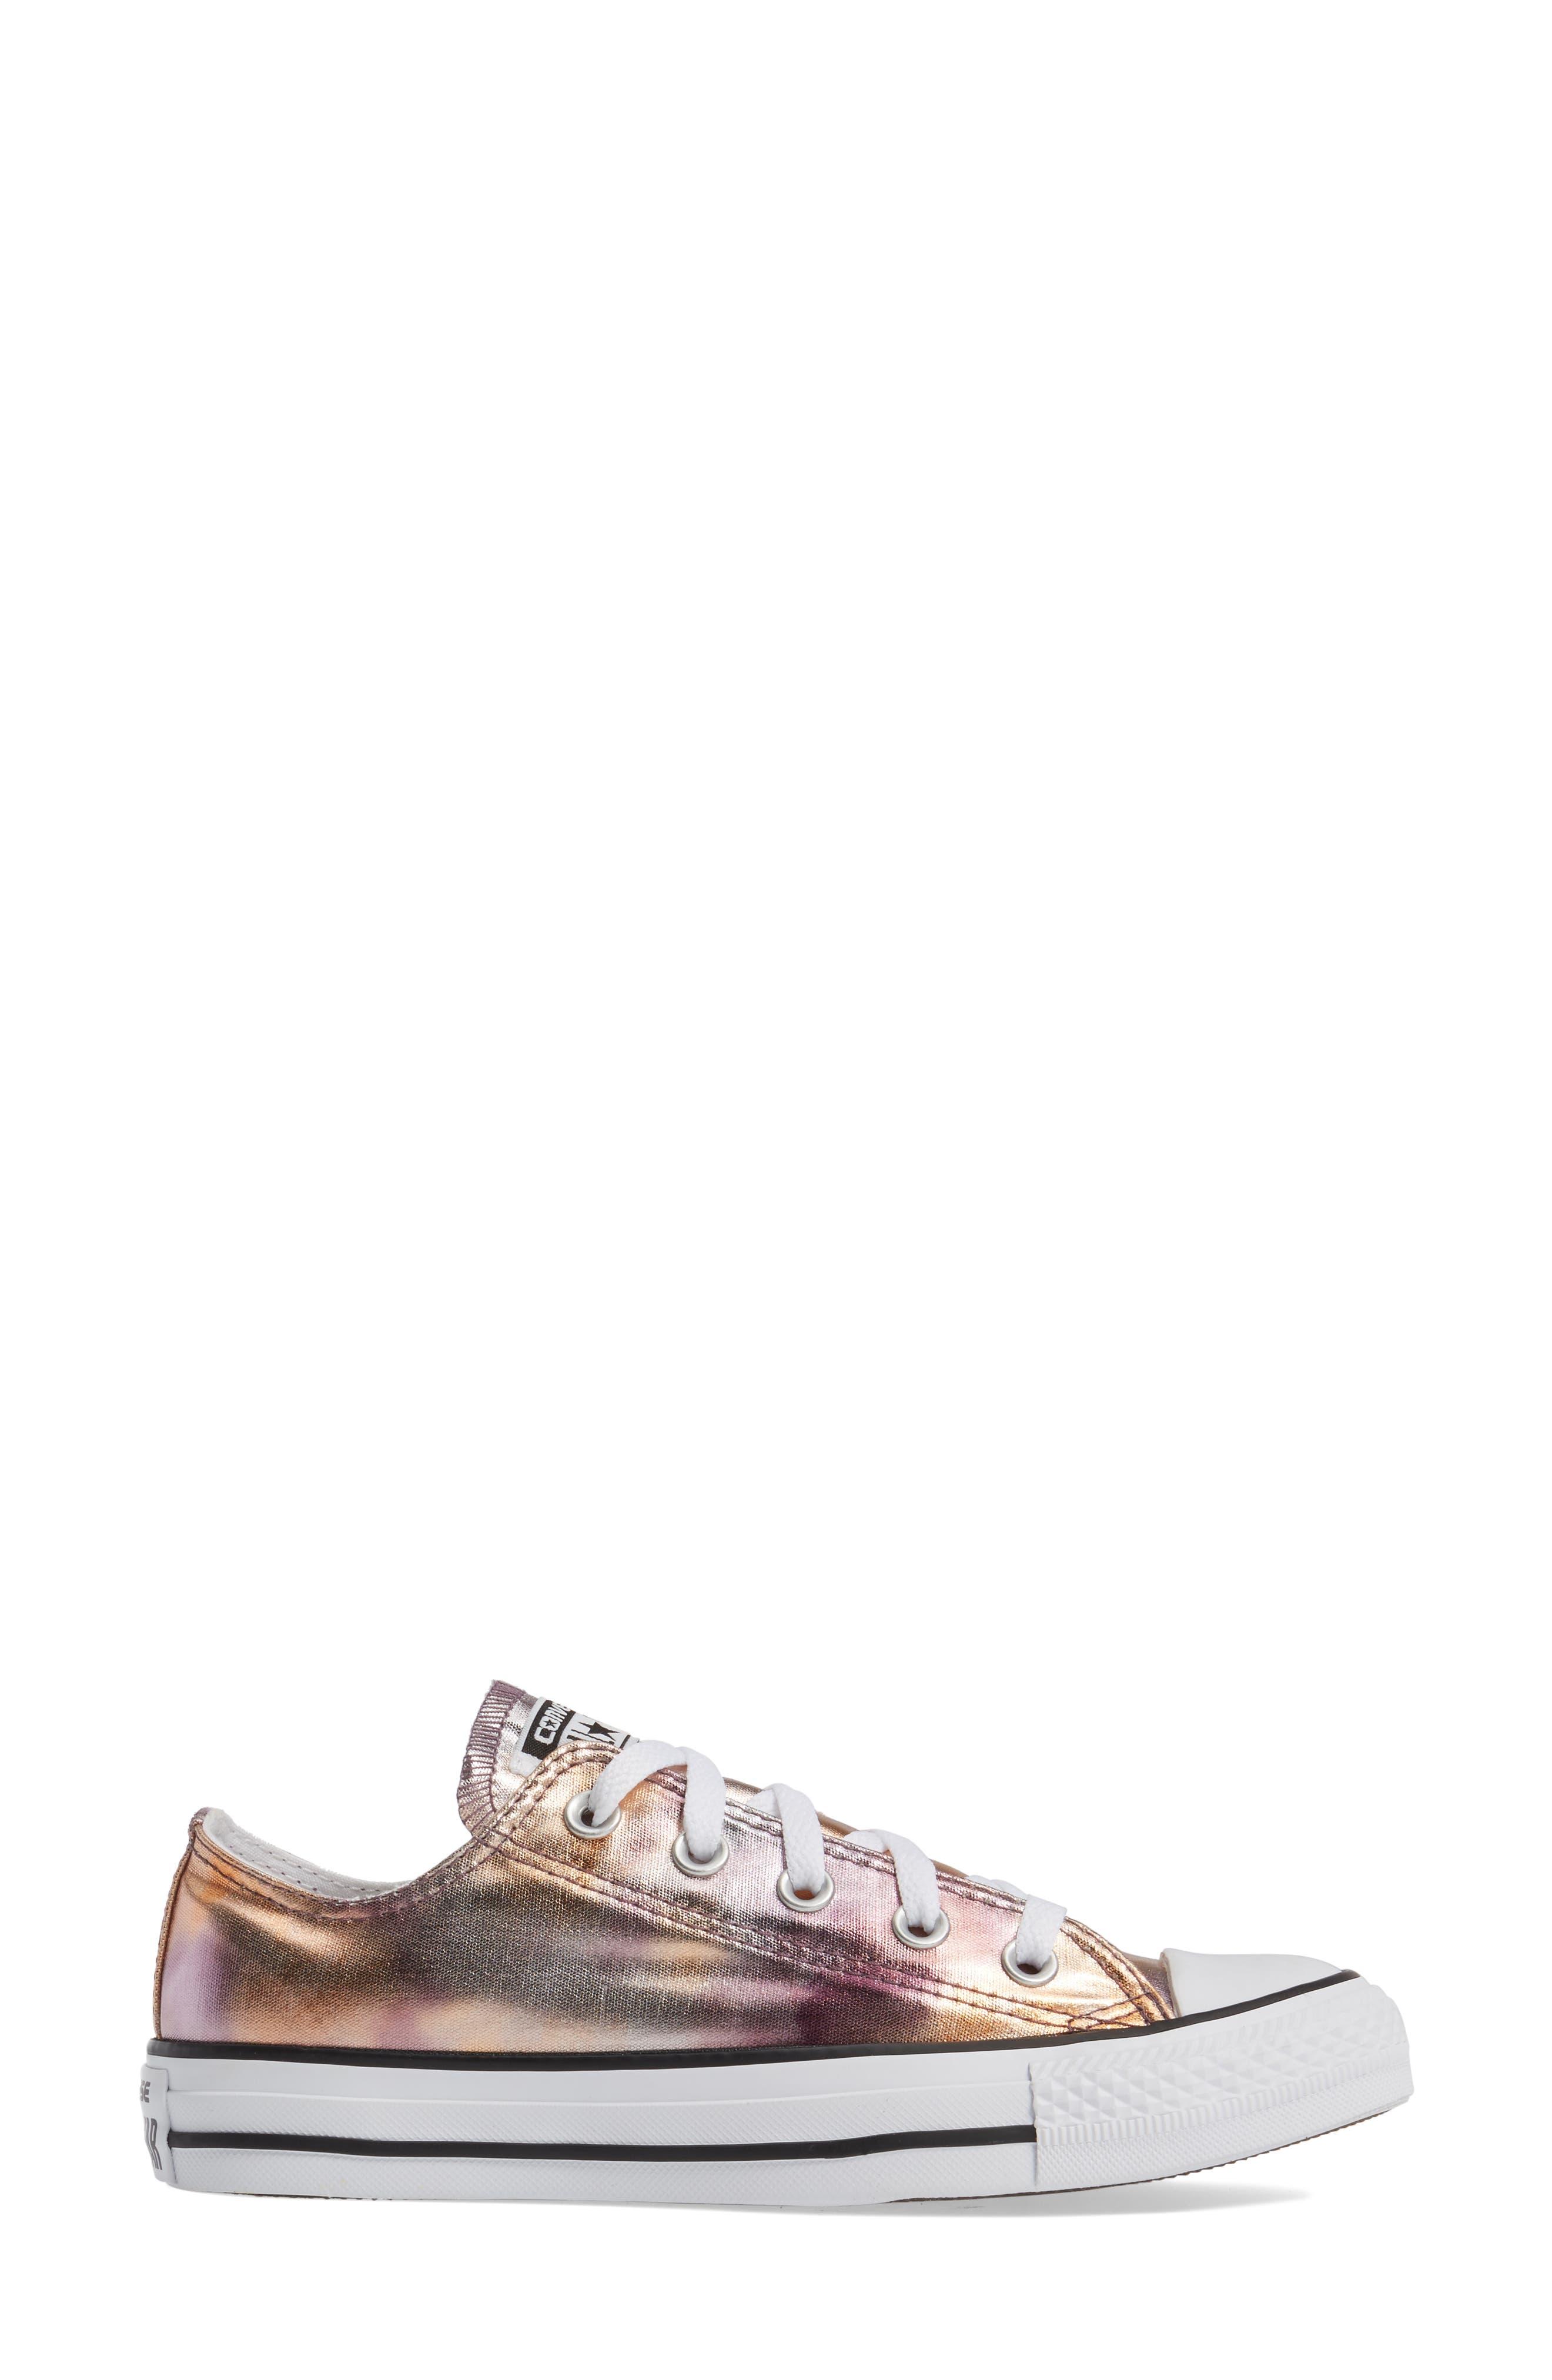 Chuck Taylor<sup>®</sup> All Star<sup>®</sup> Seasonal Metallic Ox Low Top Sneaker,                             Alternate thumbnail 3, color,                             Dusk Pink